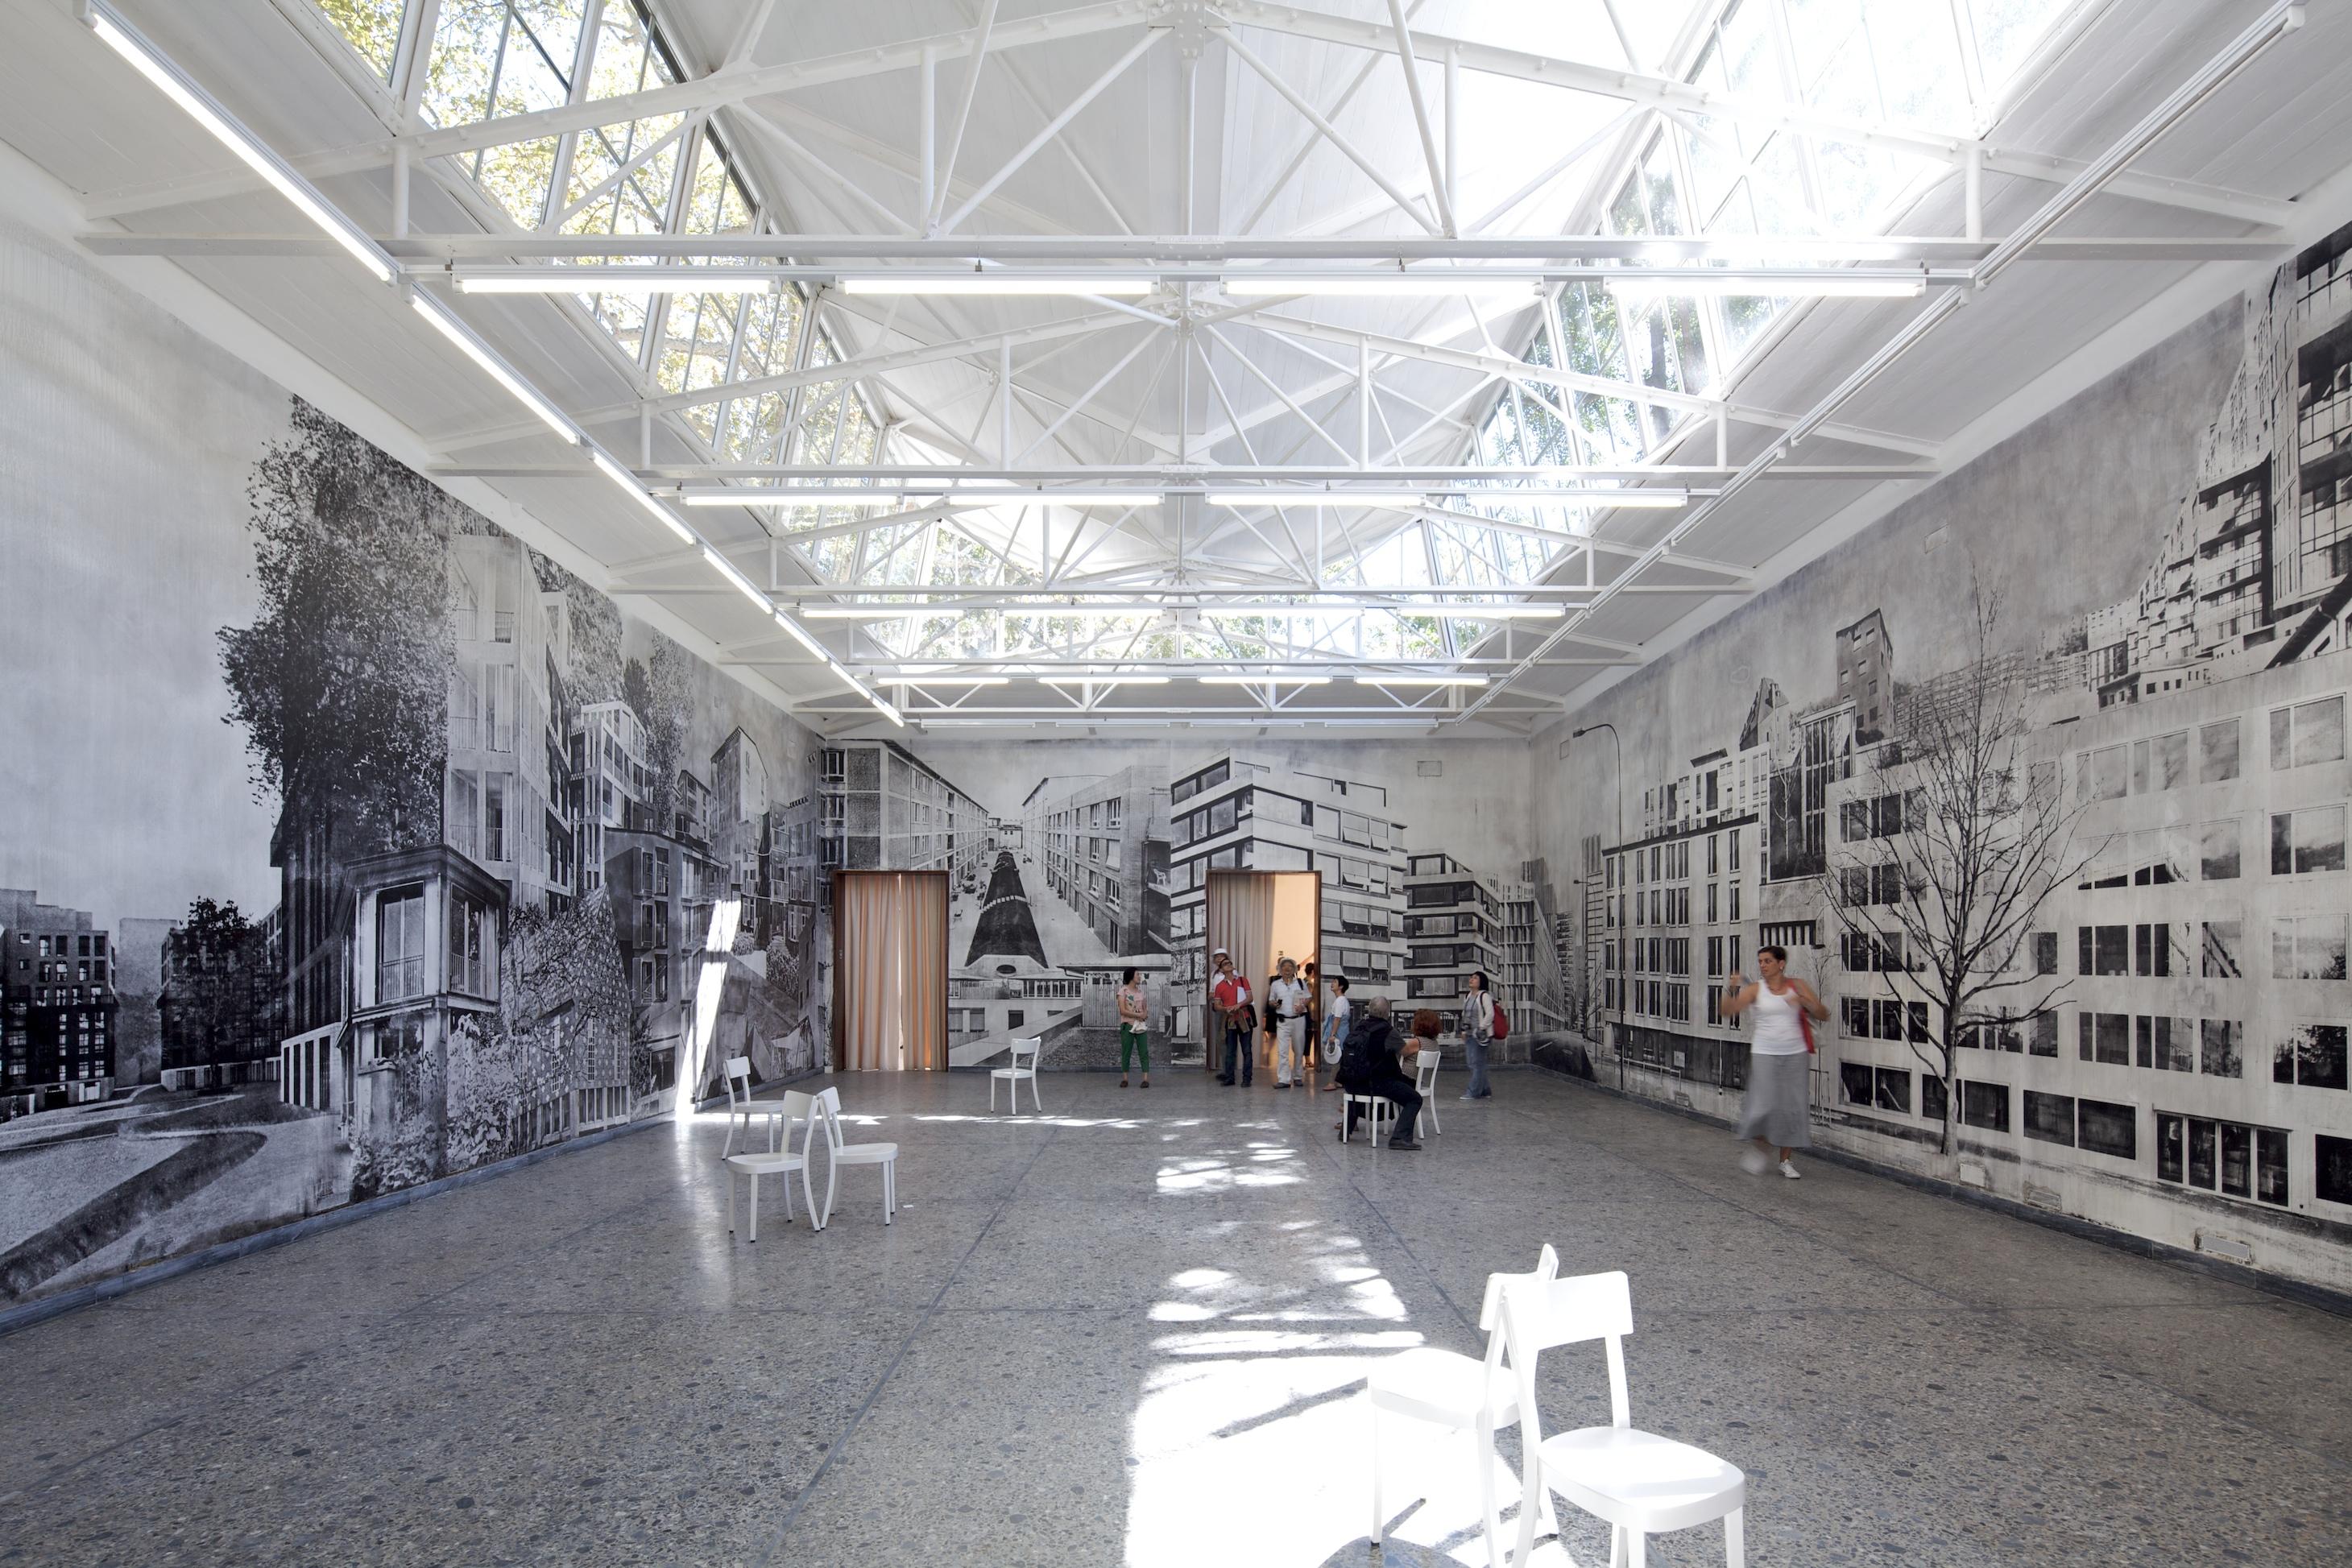 Bienal de Veneza 2012: Pavilhão da Suíça, © Nico Saieh